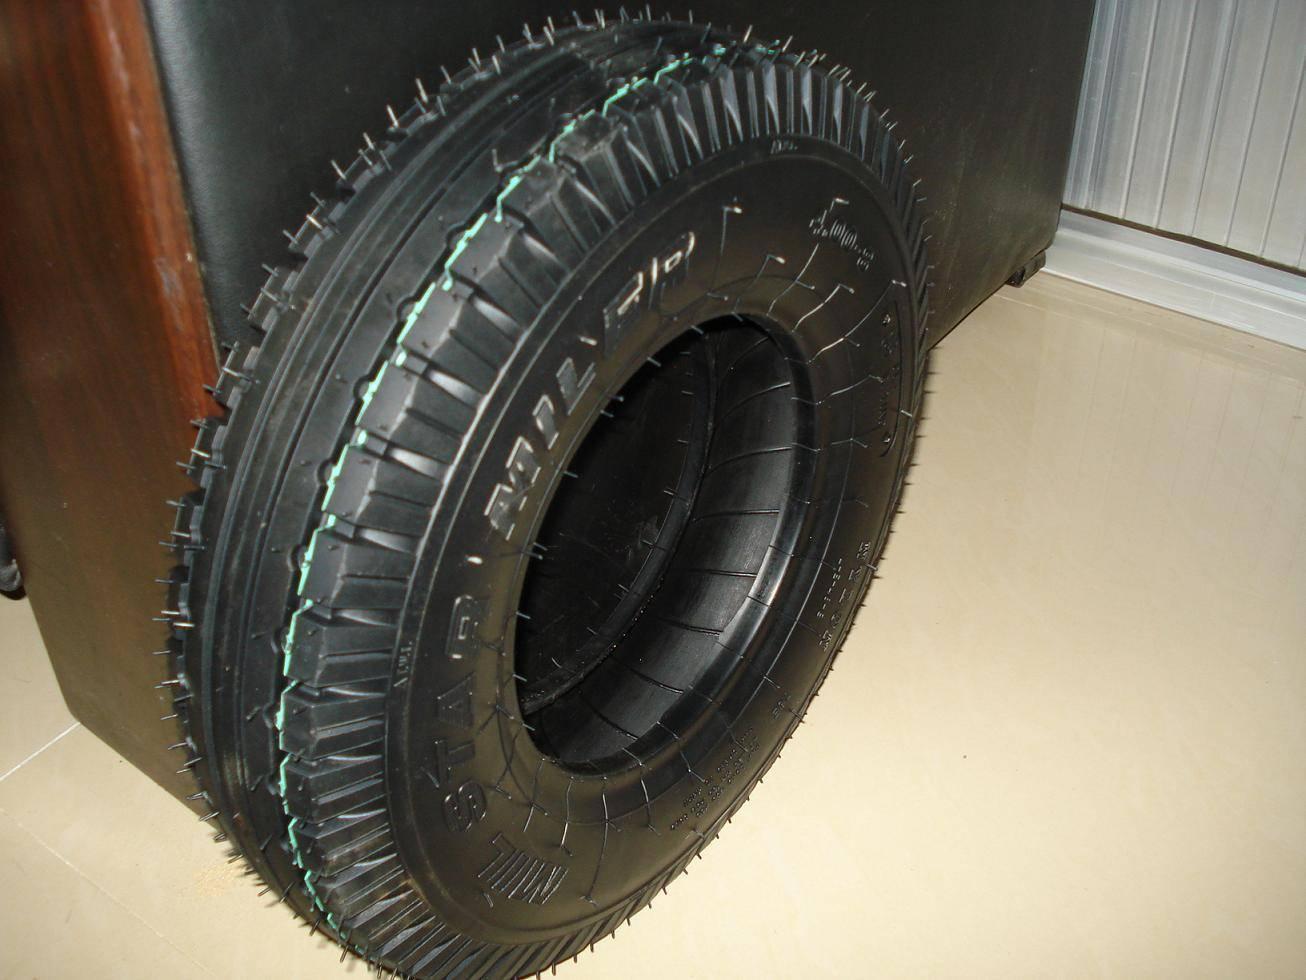 motorcycle tire three wheeler tire 4.00-8, 4.00-12, 4.00-16, 5.50-16, 6.50-16 4.00-8 4.80/4.00-8